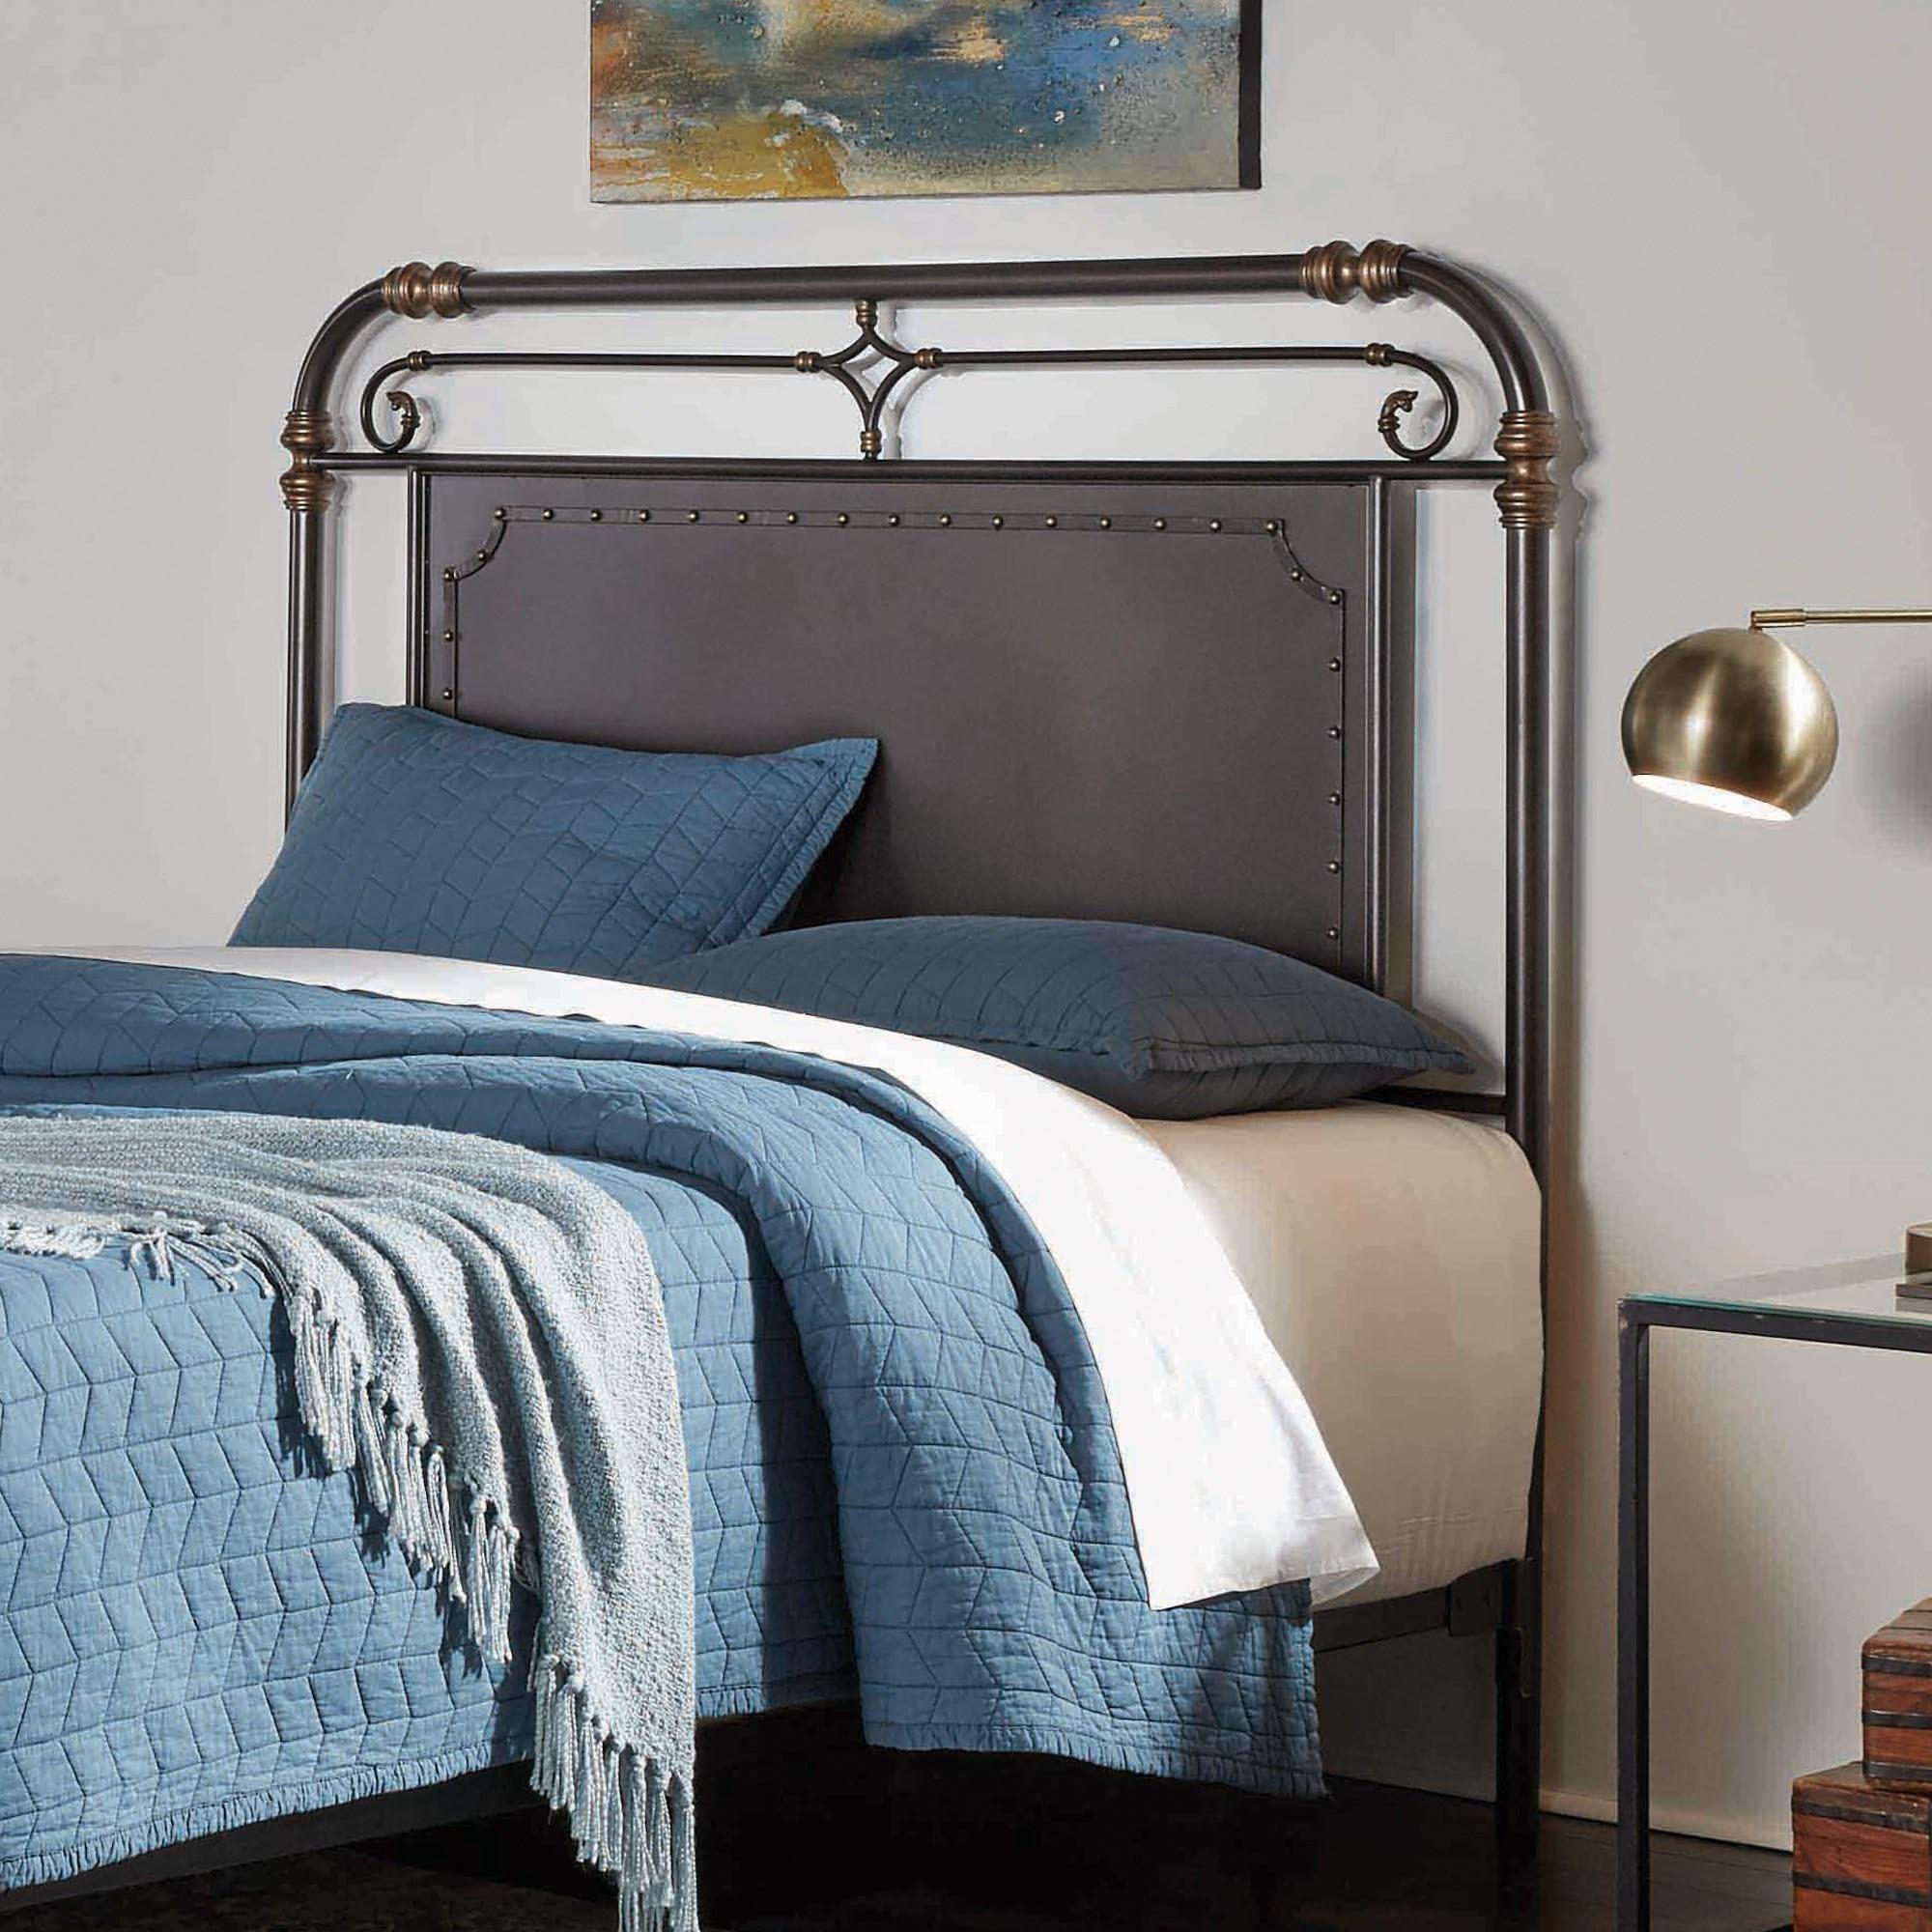 Fashion Bed Group Westchester B12d45 Queen Westchester Metal Headboard Pilgrim Furniture City